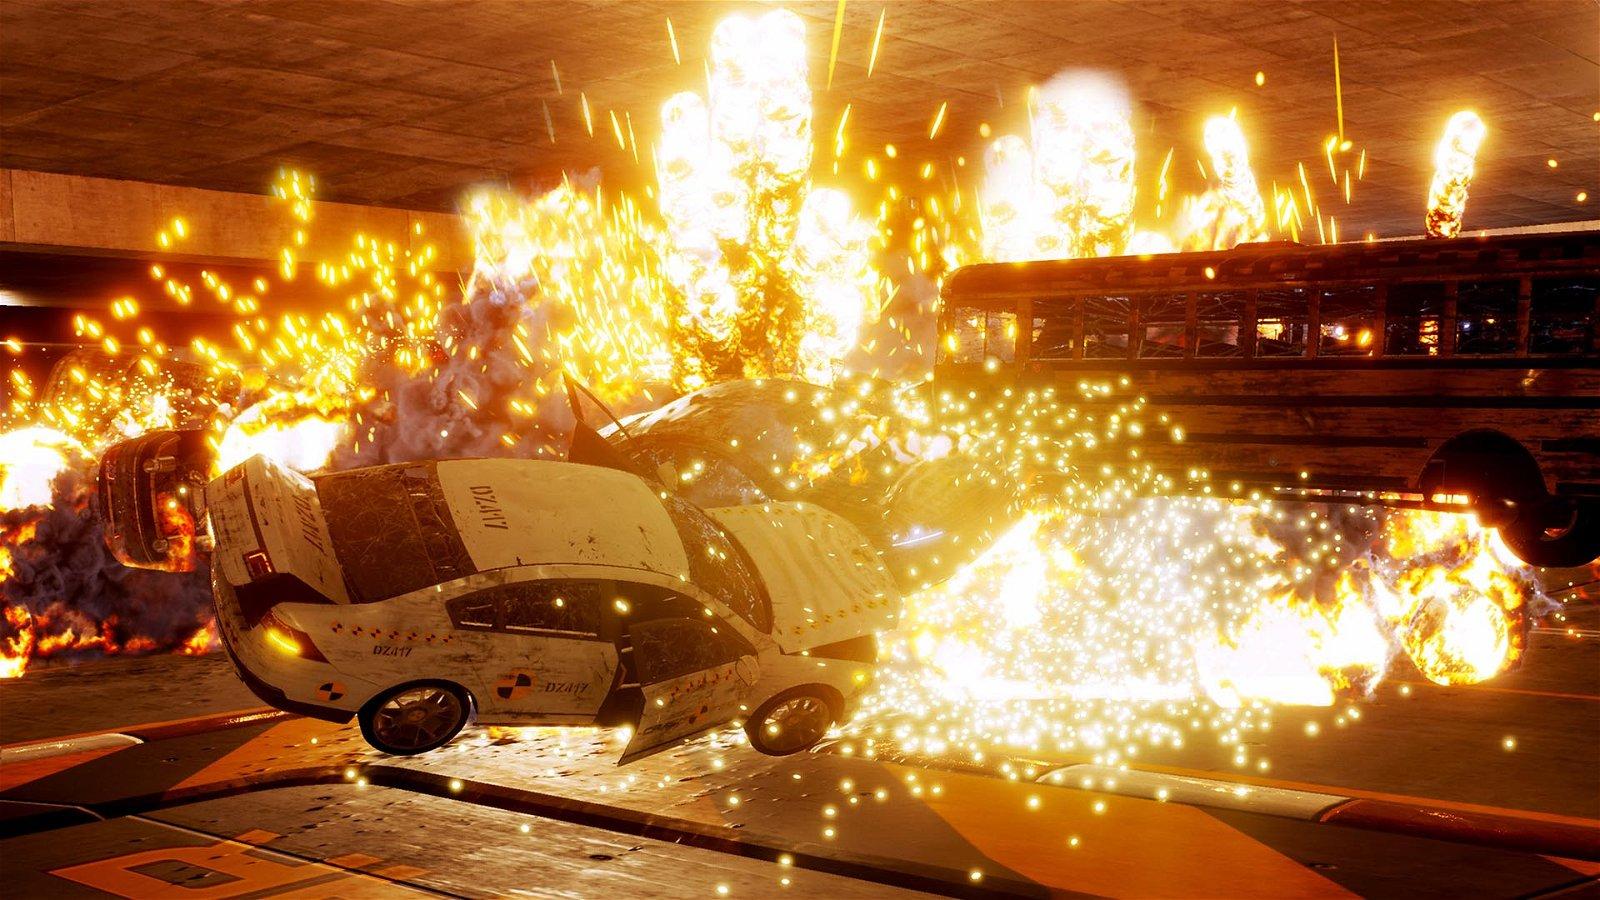 Danger Zone Review - Successing Burnout 1